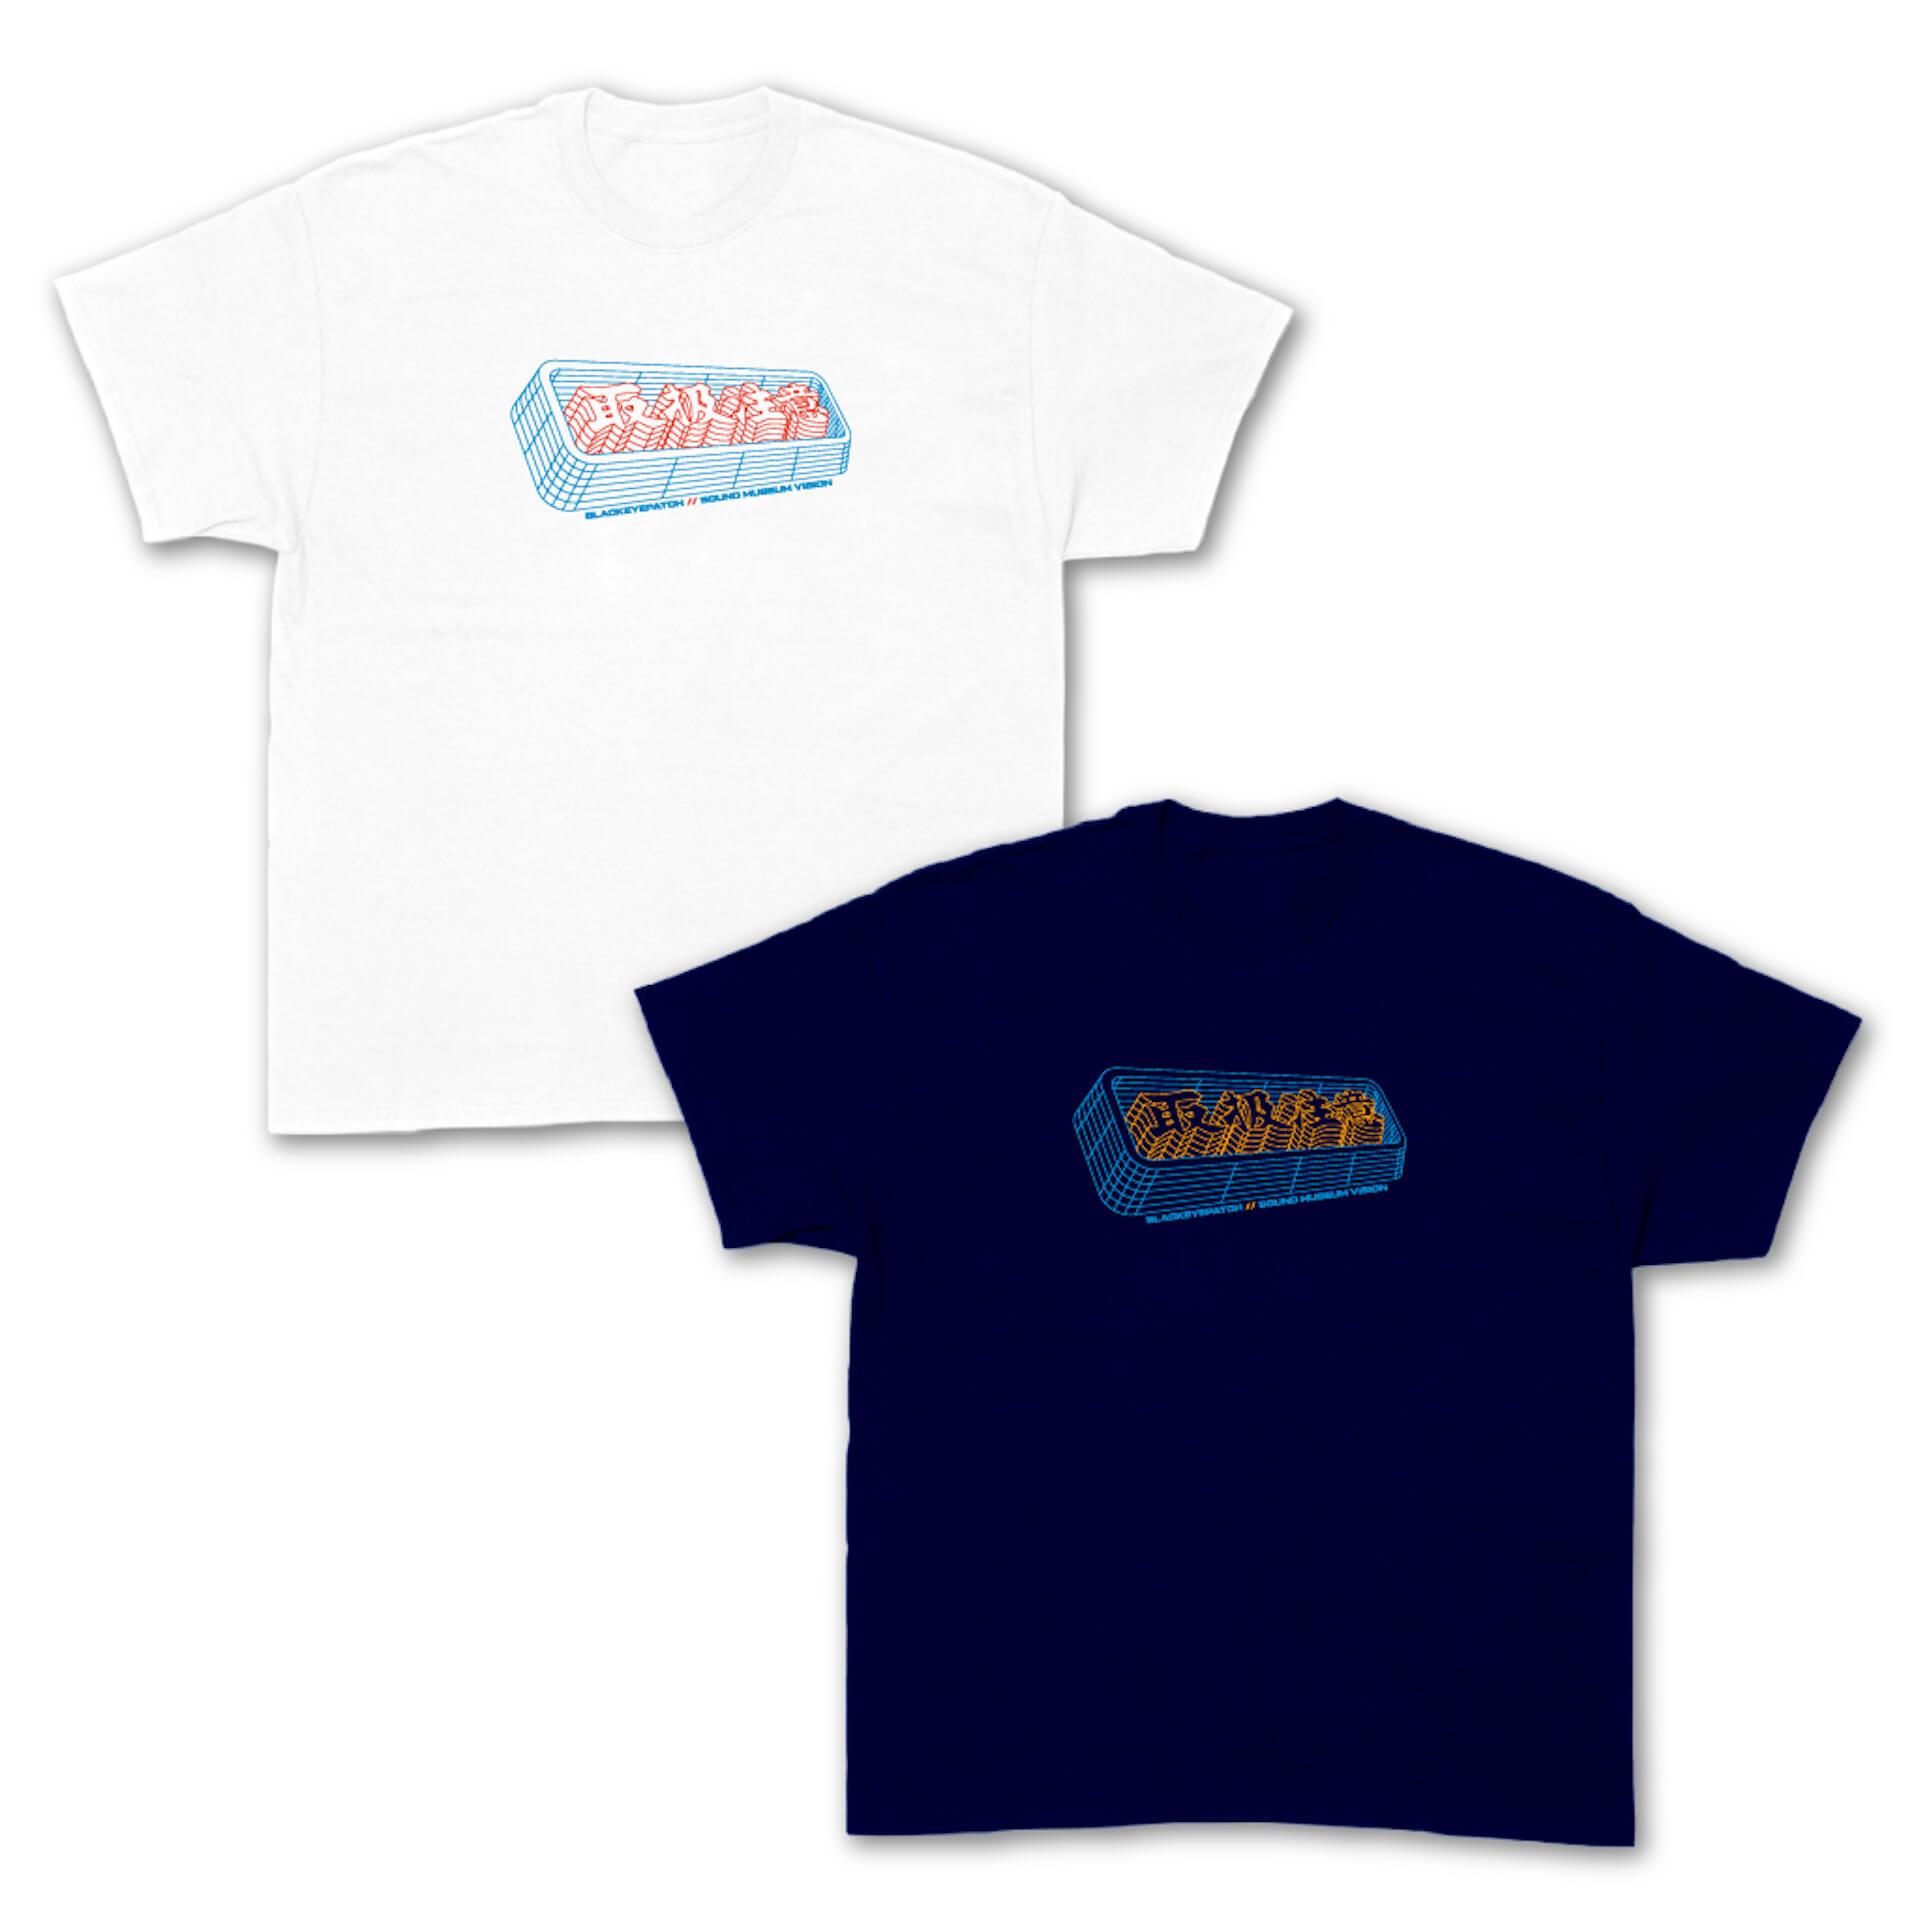 Contact Tokyo&SOUND MUSEUM VISIONのオリジナルデザインTシャツが発売決定!野村訓市、UNDERCOVER、VERDY、YAGIが参加 life210713_contact_vision_4